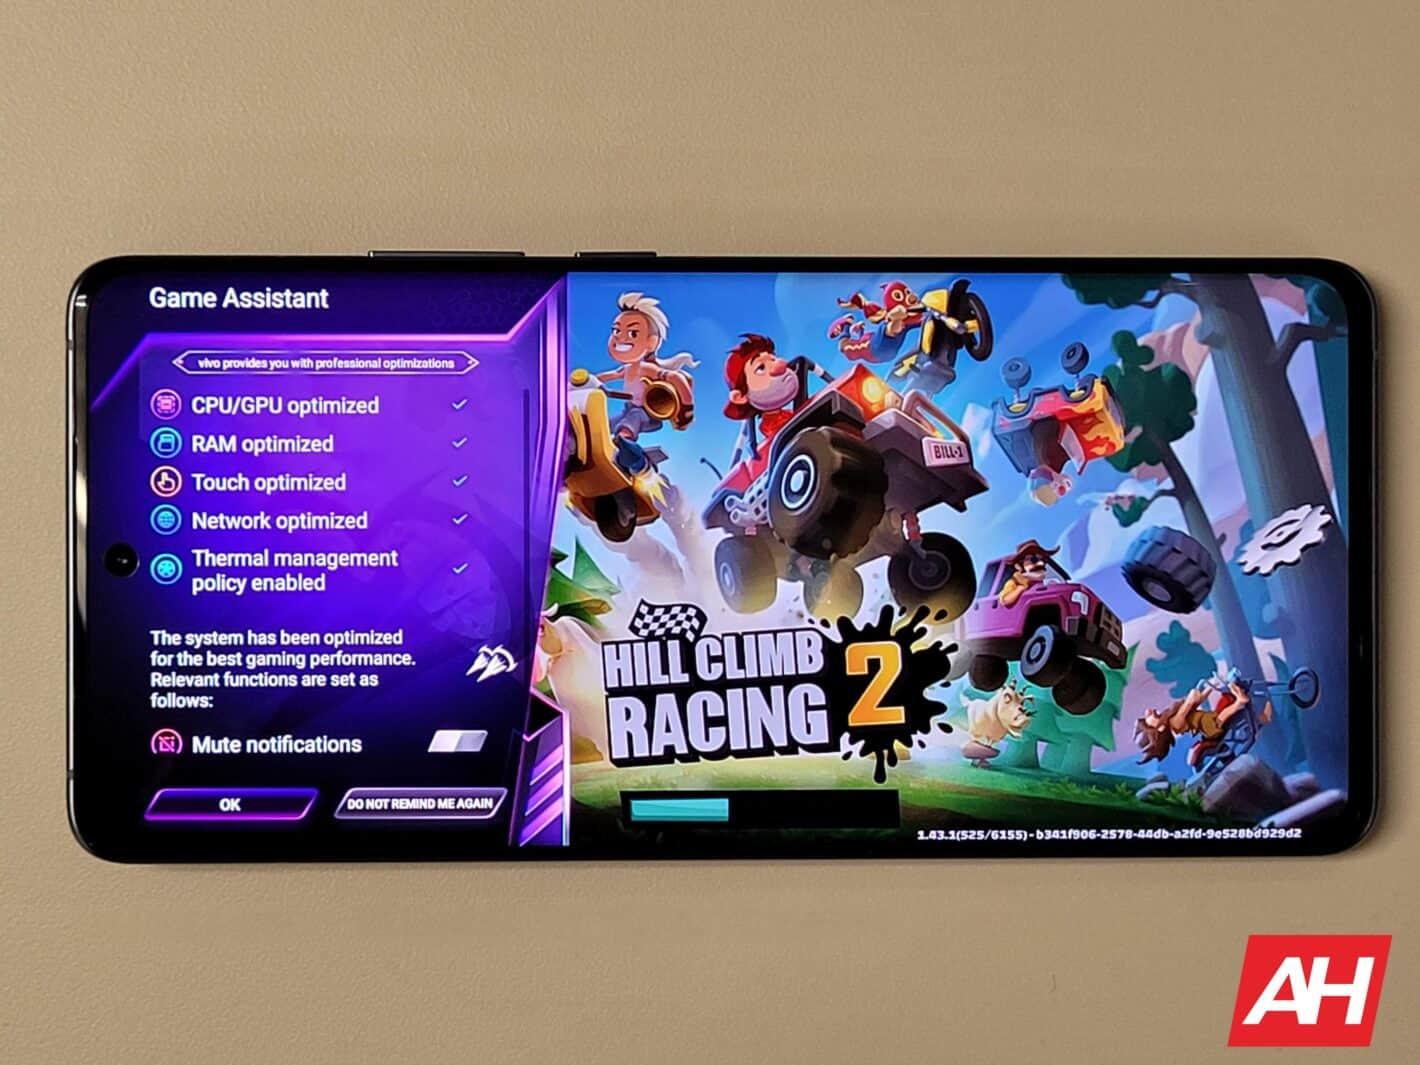 Vivo X60 Pro AH HR Gaming